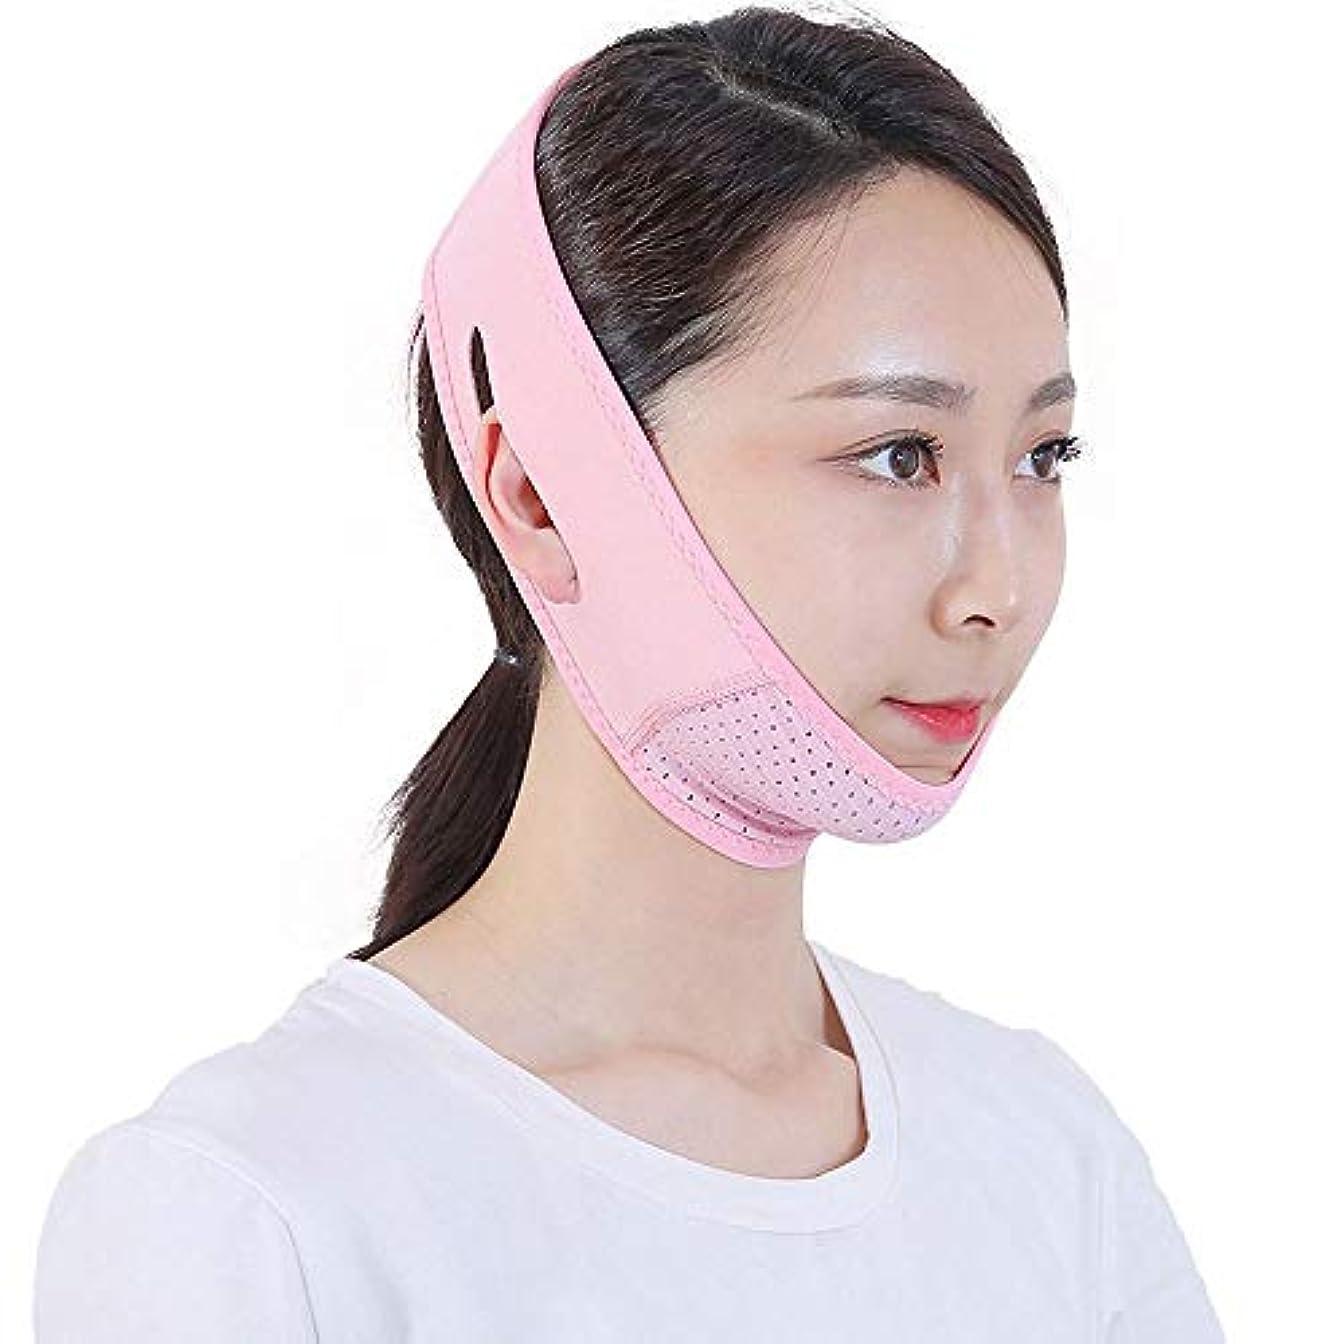 HEMFV 顔のリフティングスリミングベルト、Vラインチンチークリフトアップバンドの女性のための、二重あごケア減量Vフェイスアンチリンクル包帯補正ベルト - レッド通気性